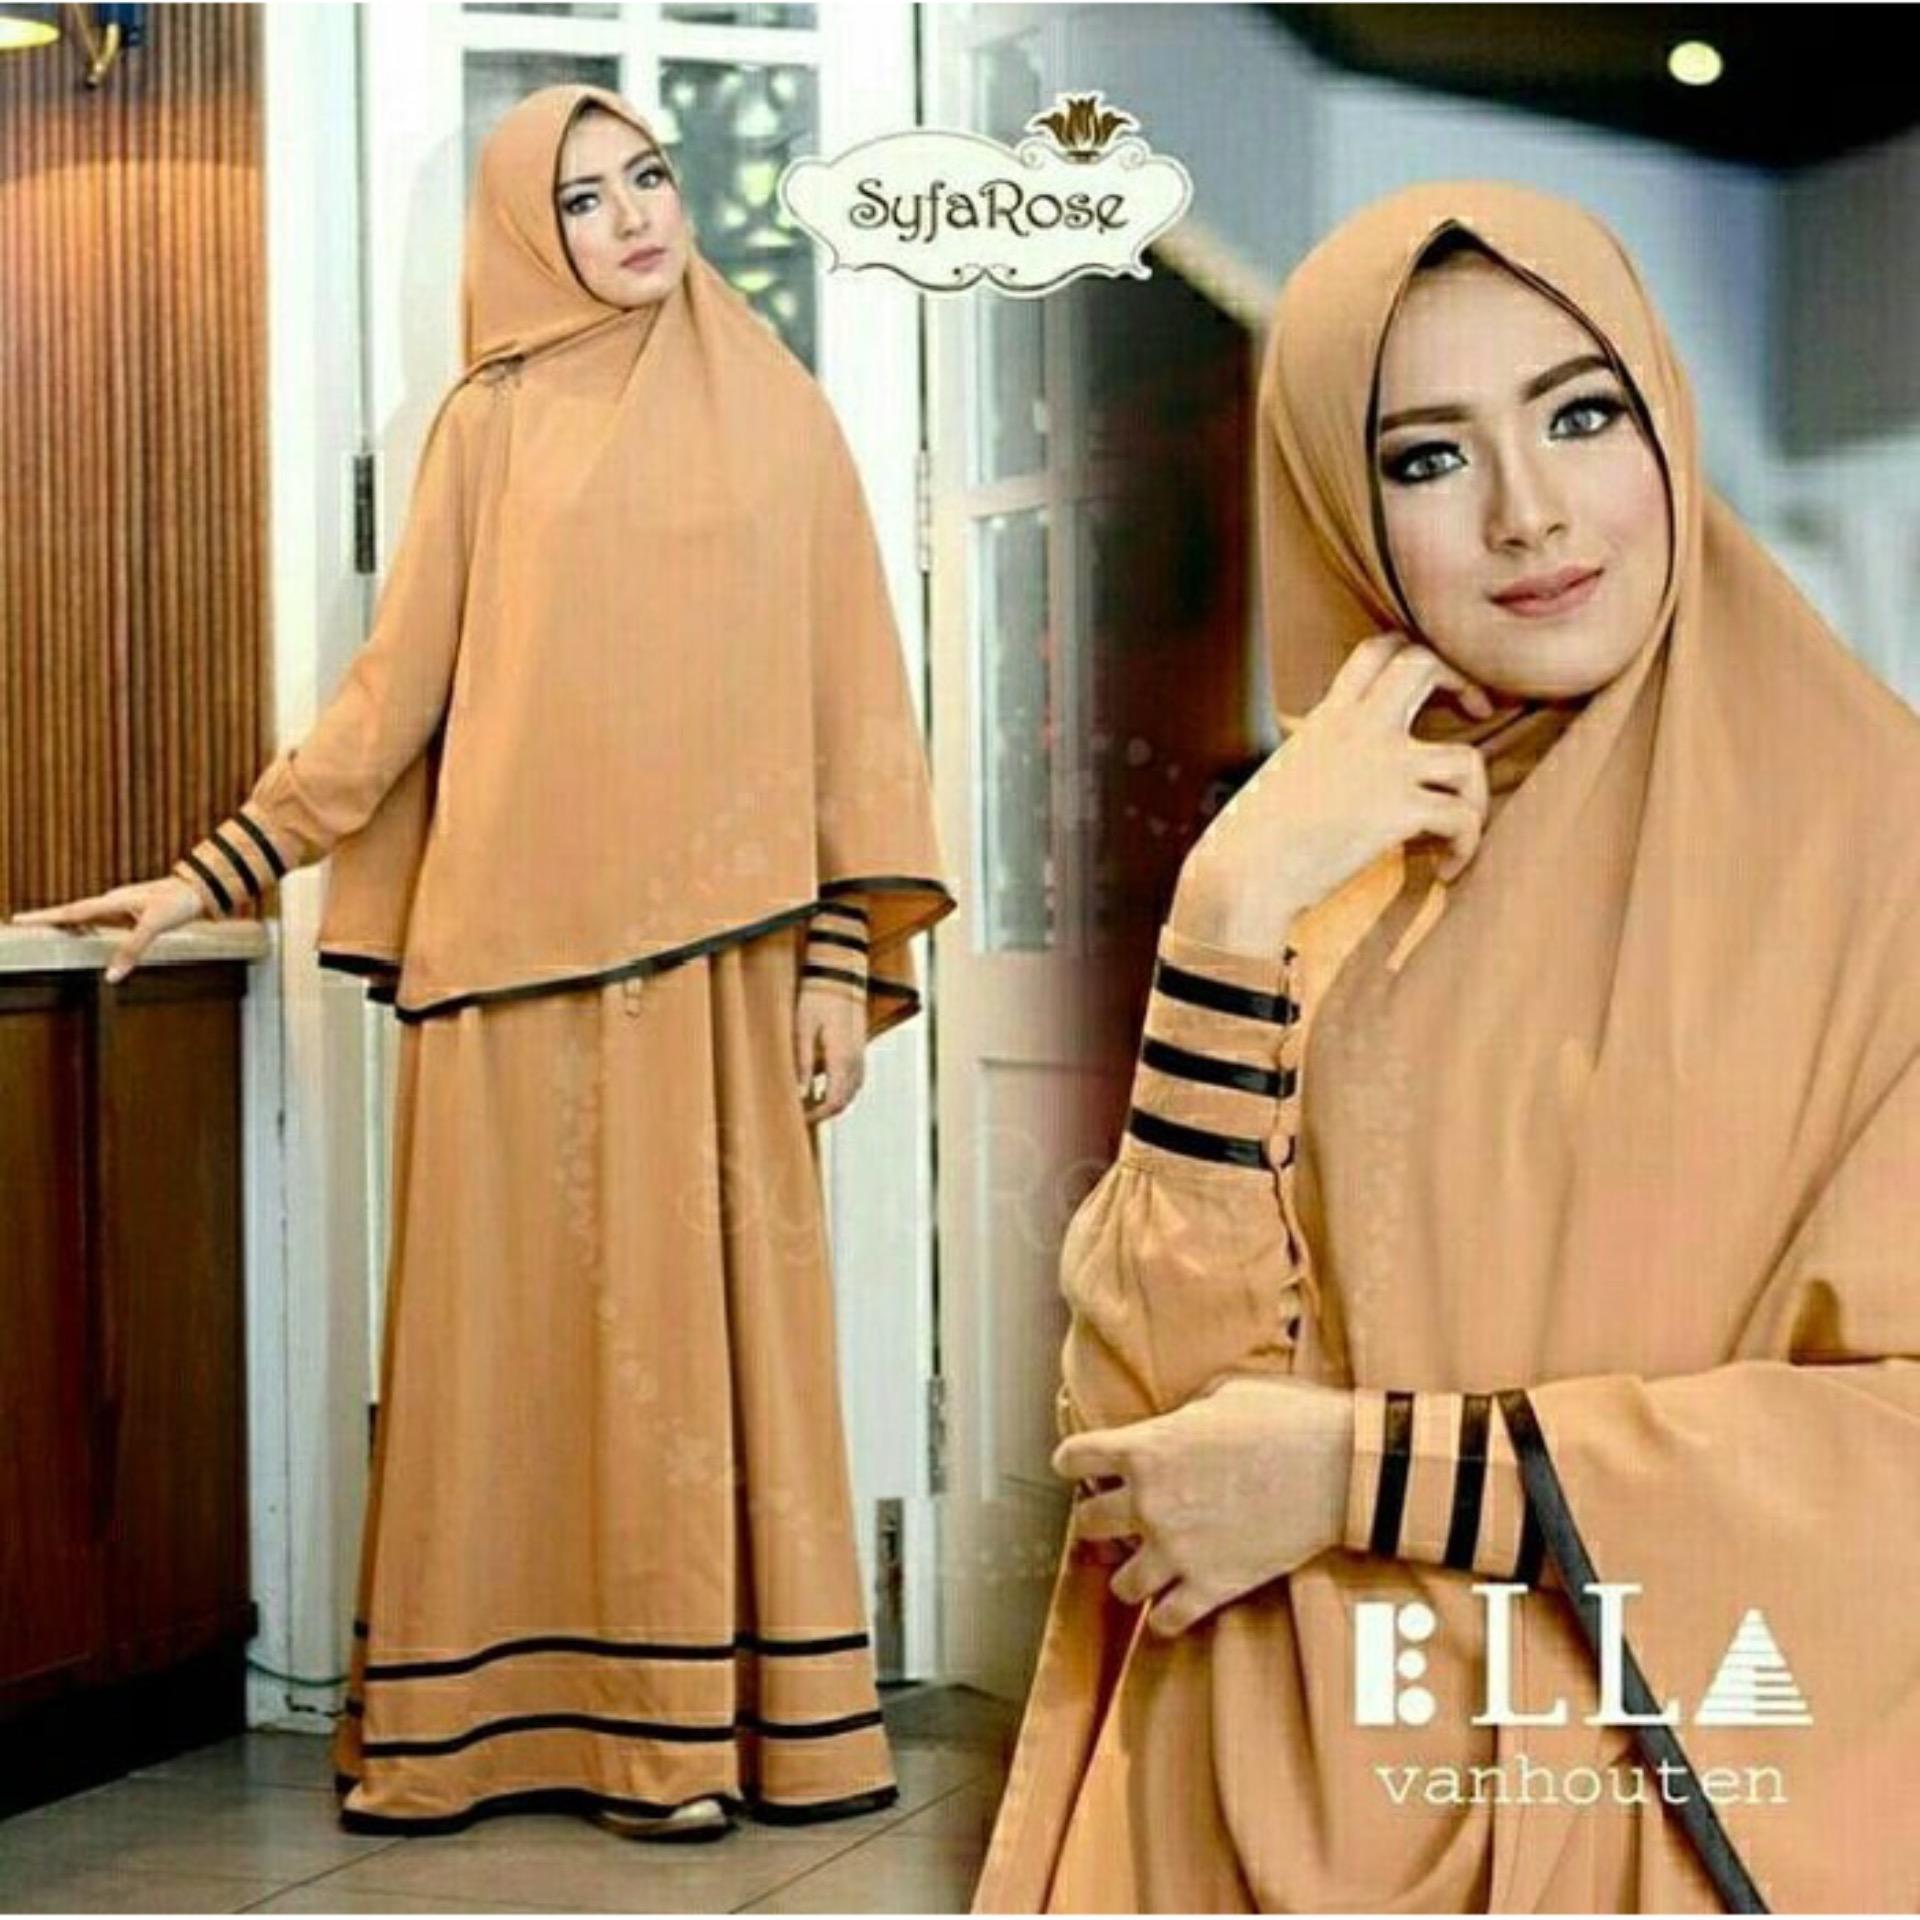 Shoppaholic Shop Baju Gamis Muslim Syfarose Coksu Dress Muslimah Hijab Muslim Gamis